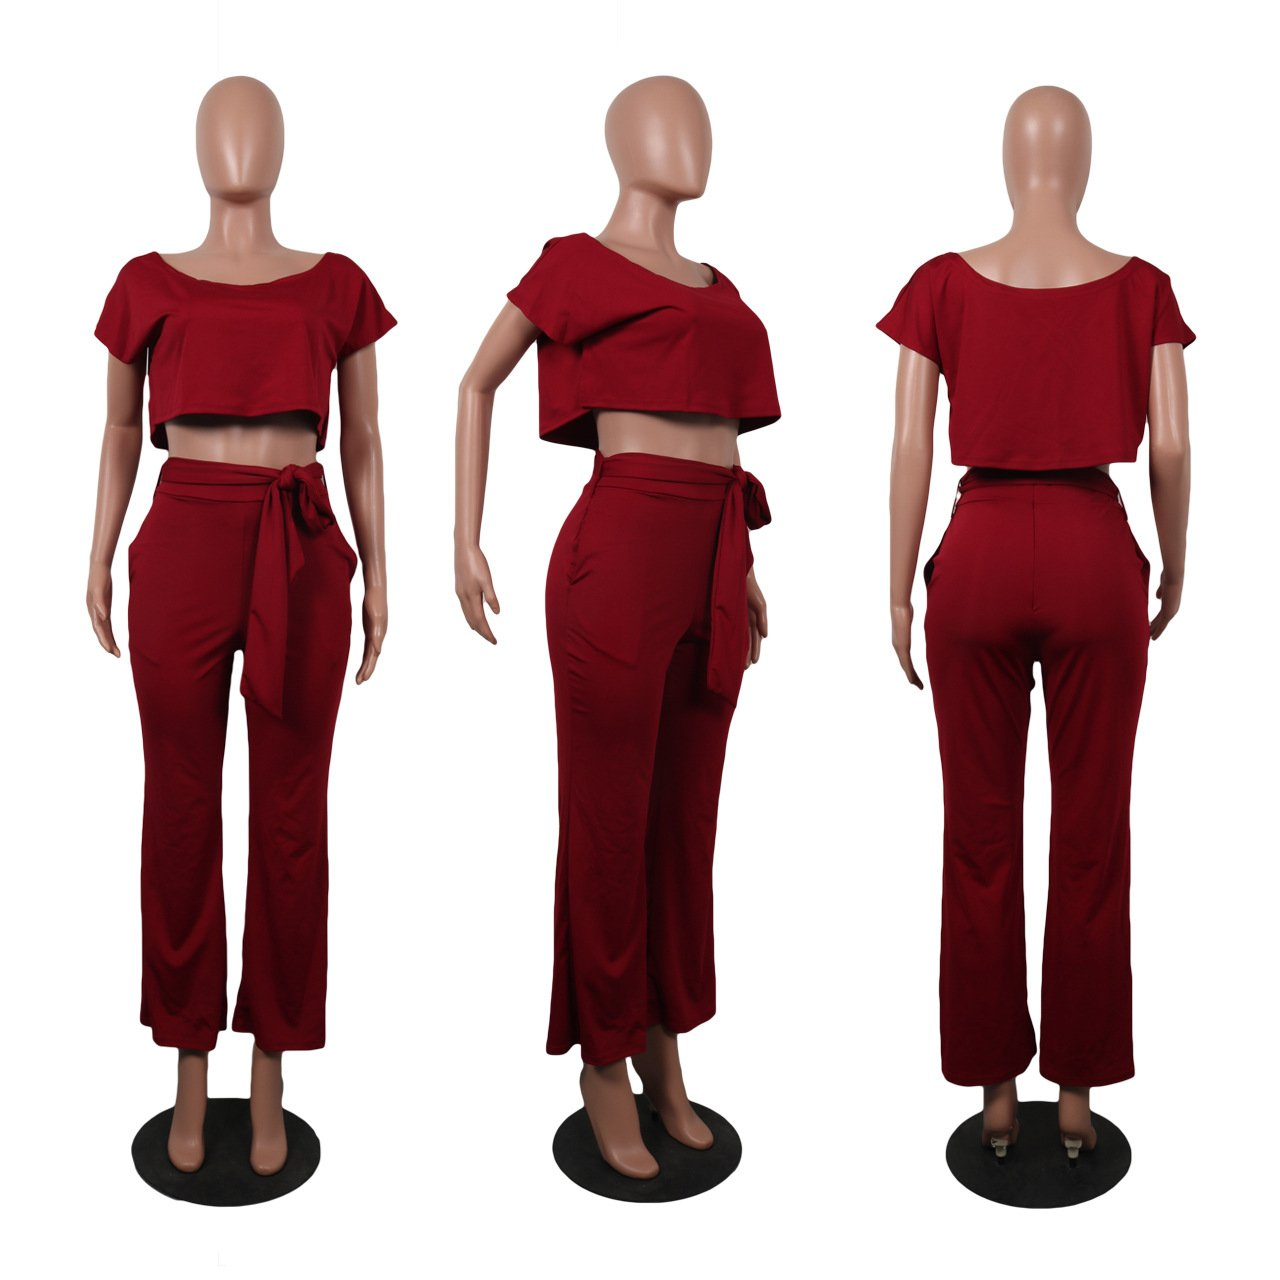 Blazar Tuta Donna Due Pezzi Estiva Maglietta Sciolto T-Shirt Tops Pantaloni Gamba Larga